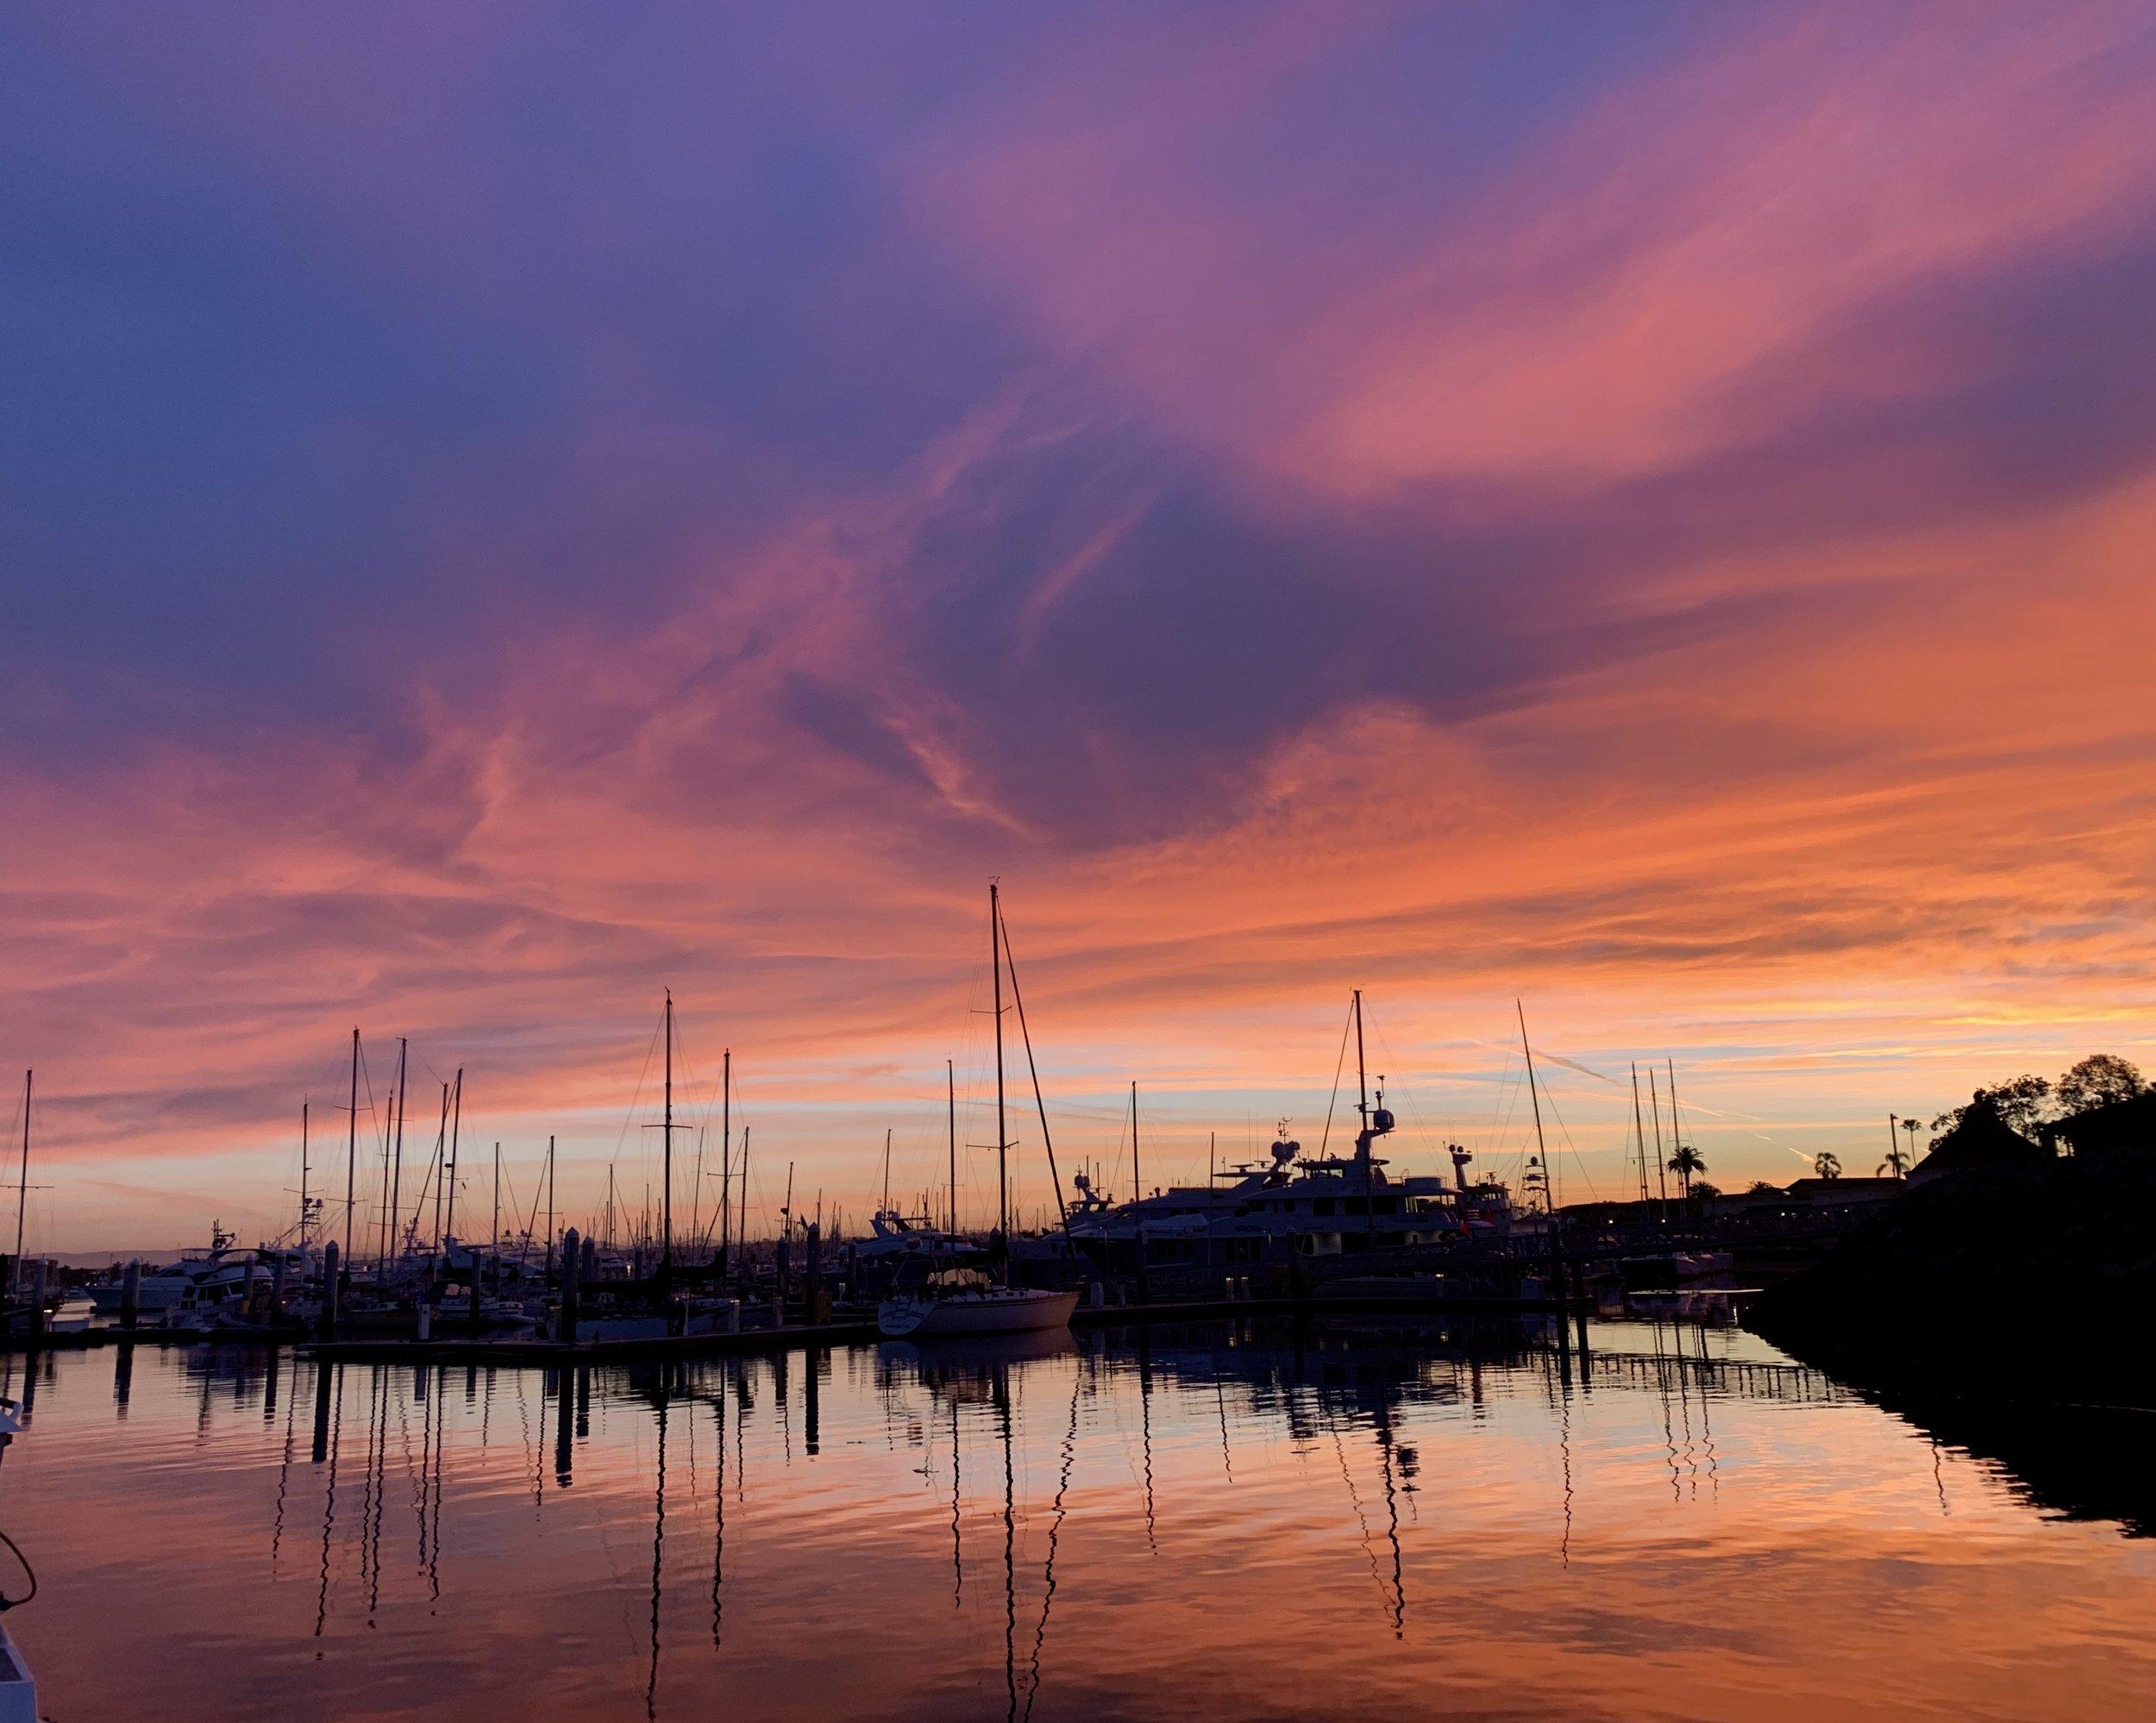 sunrise at the public docks in San Diego